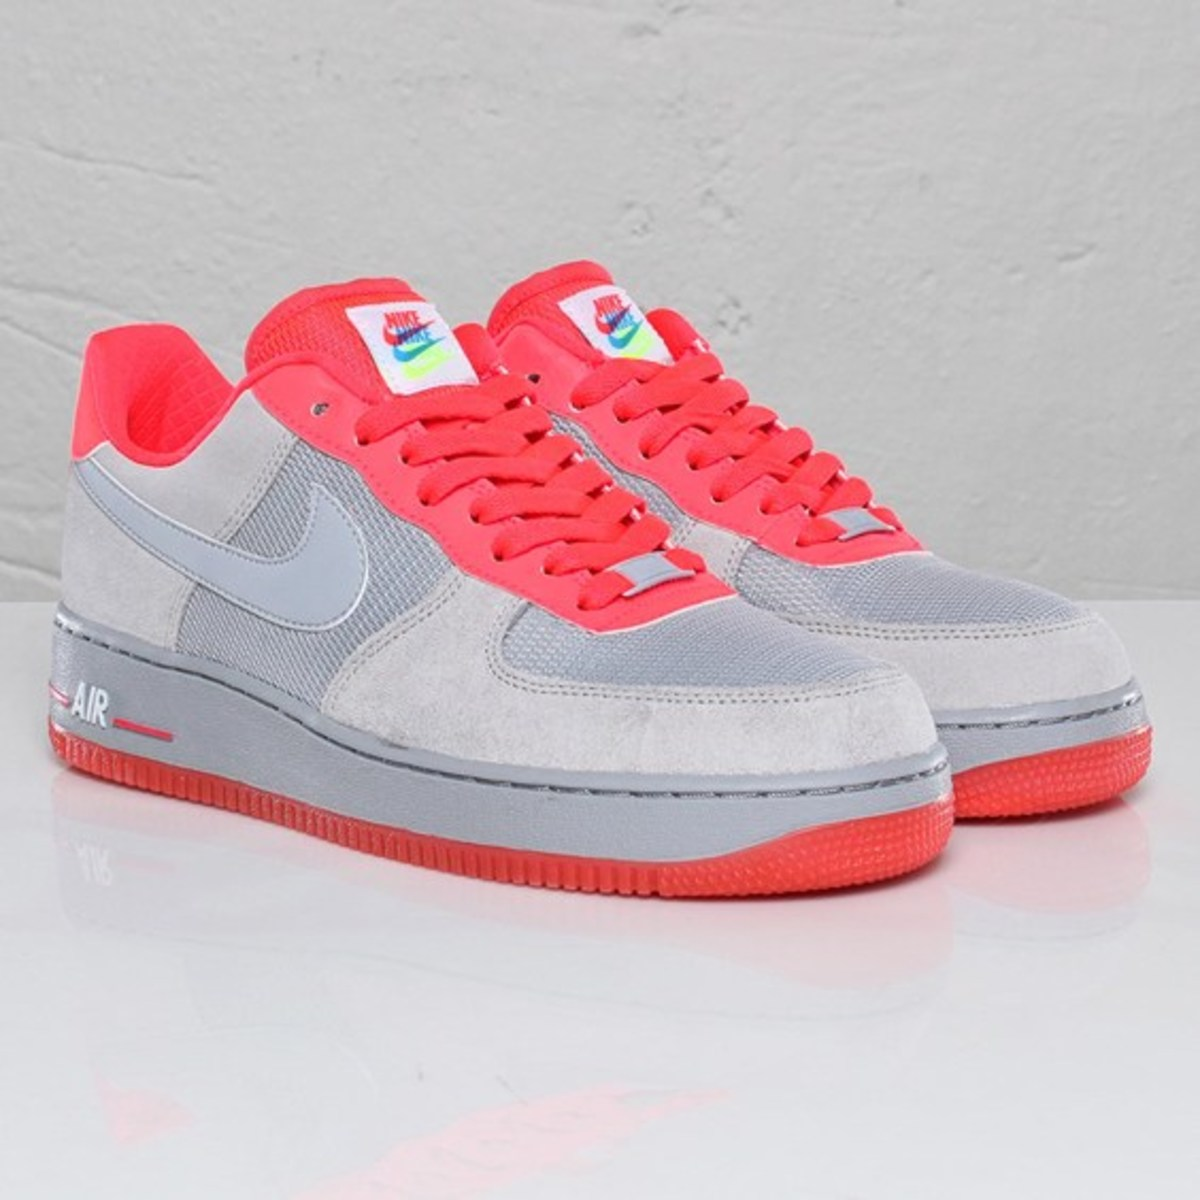 7dbfa2f821a24 Nike Air Force 1 Low